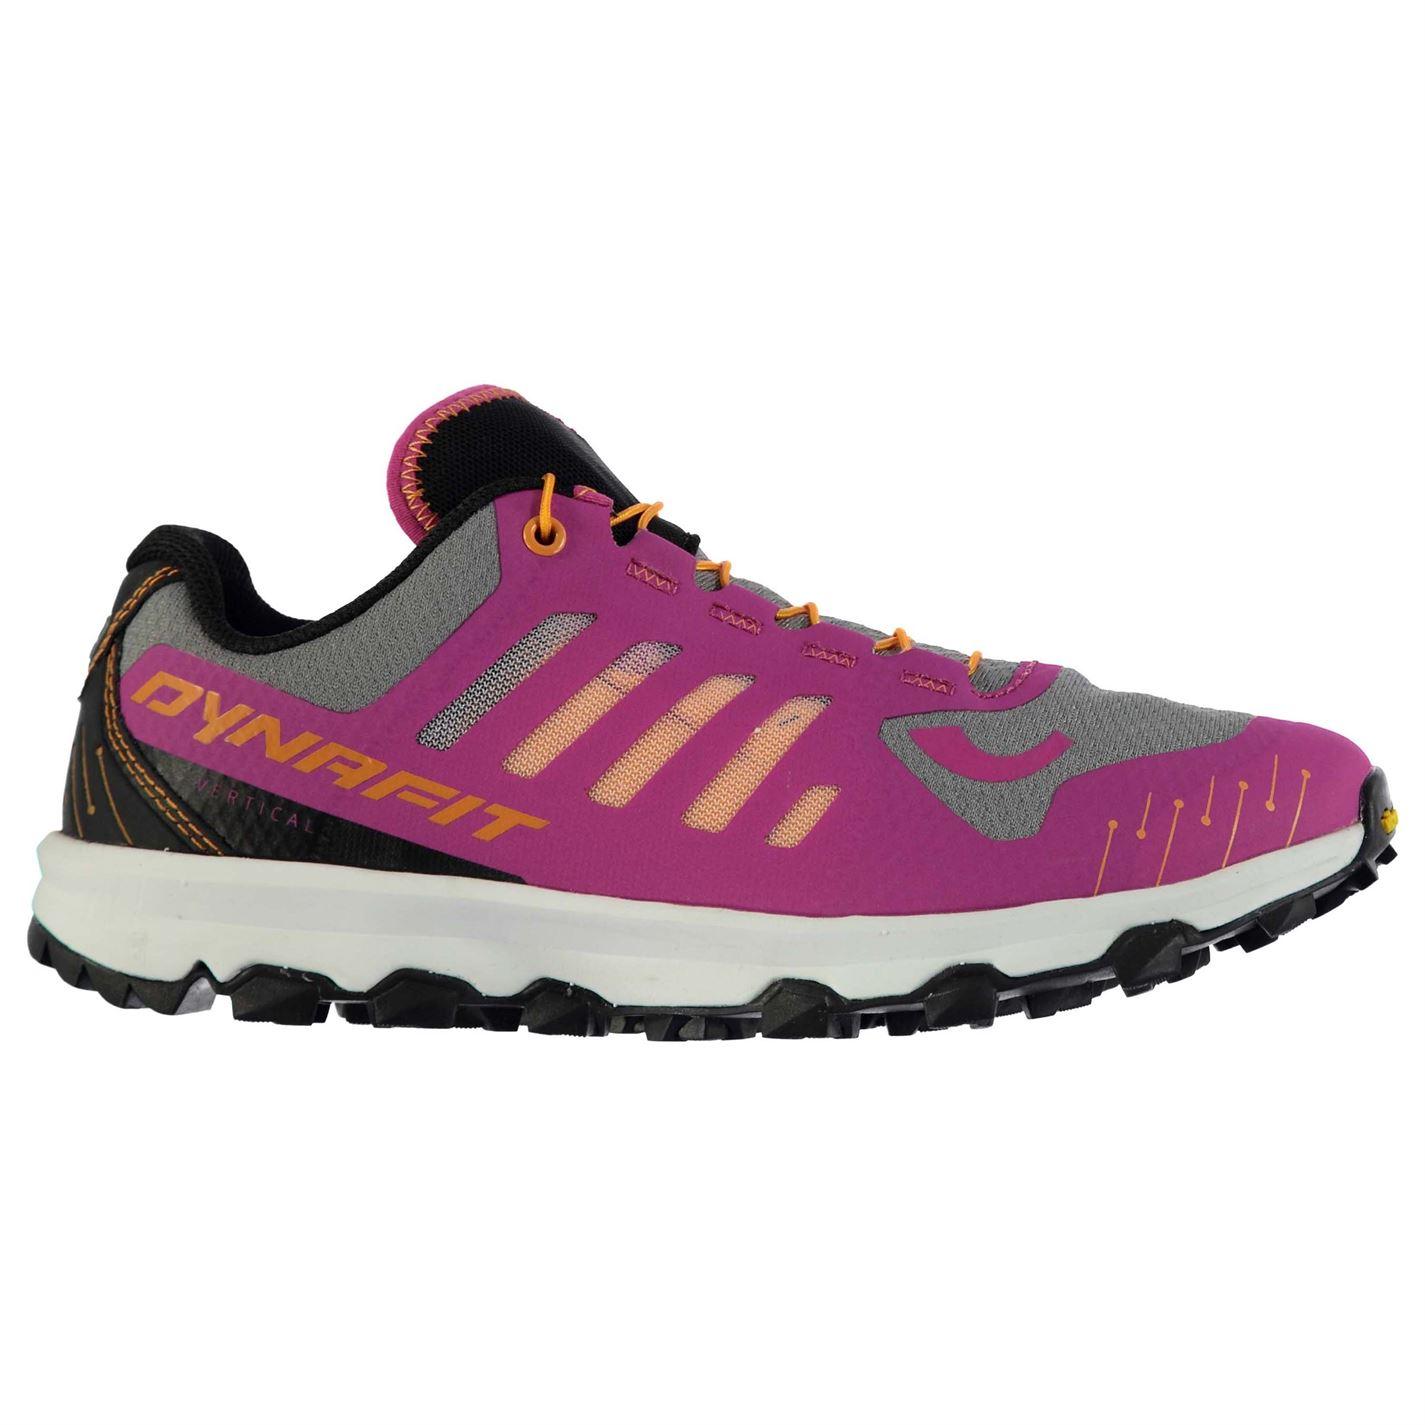 Dynafit Feline Vertical Pro Trail Running Shoes dámské